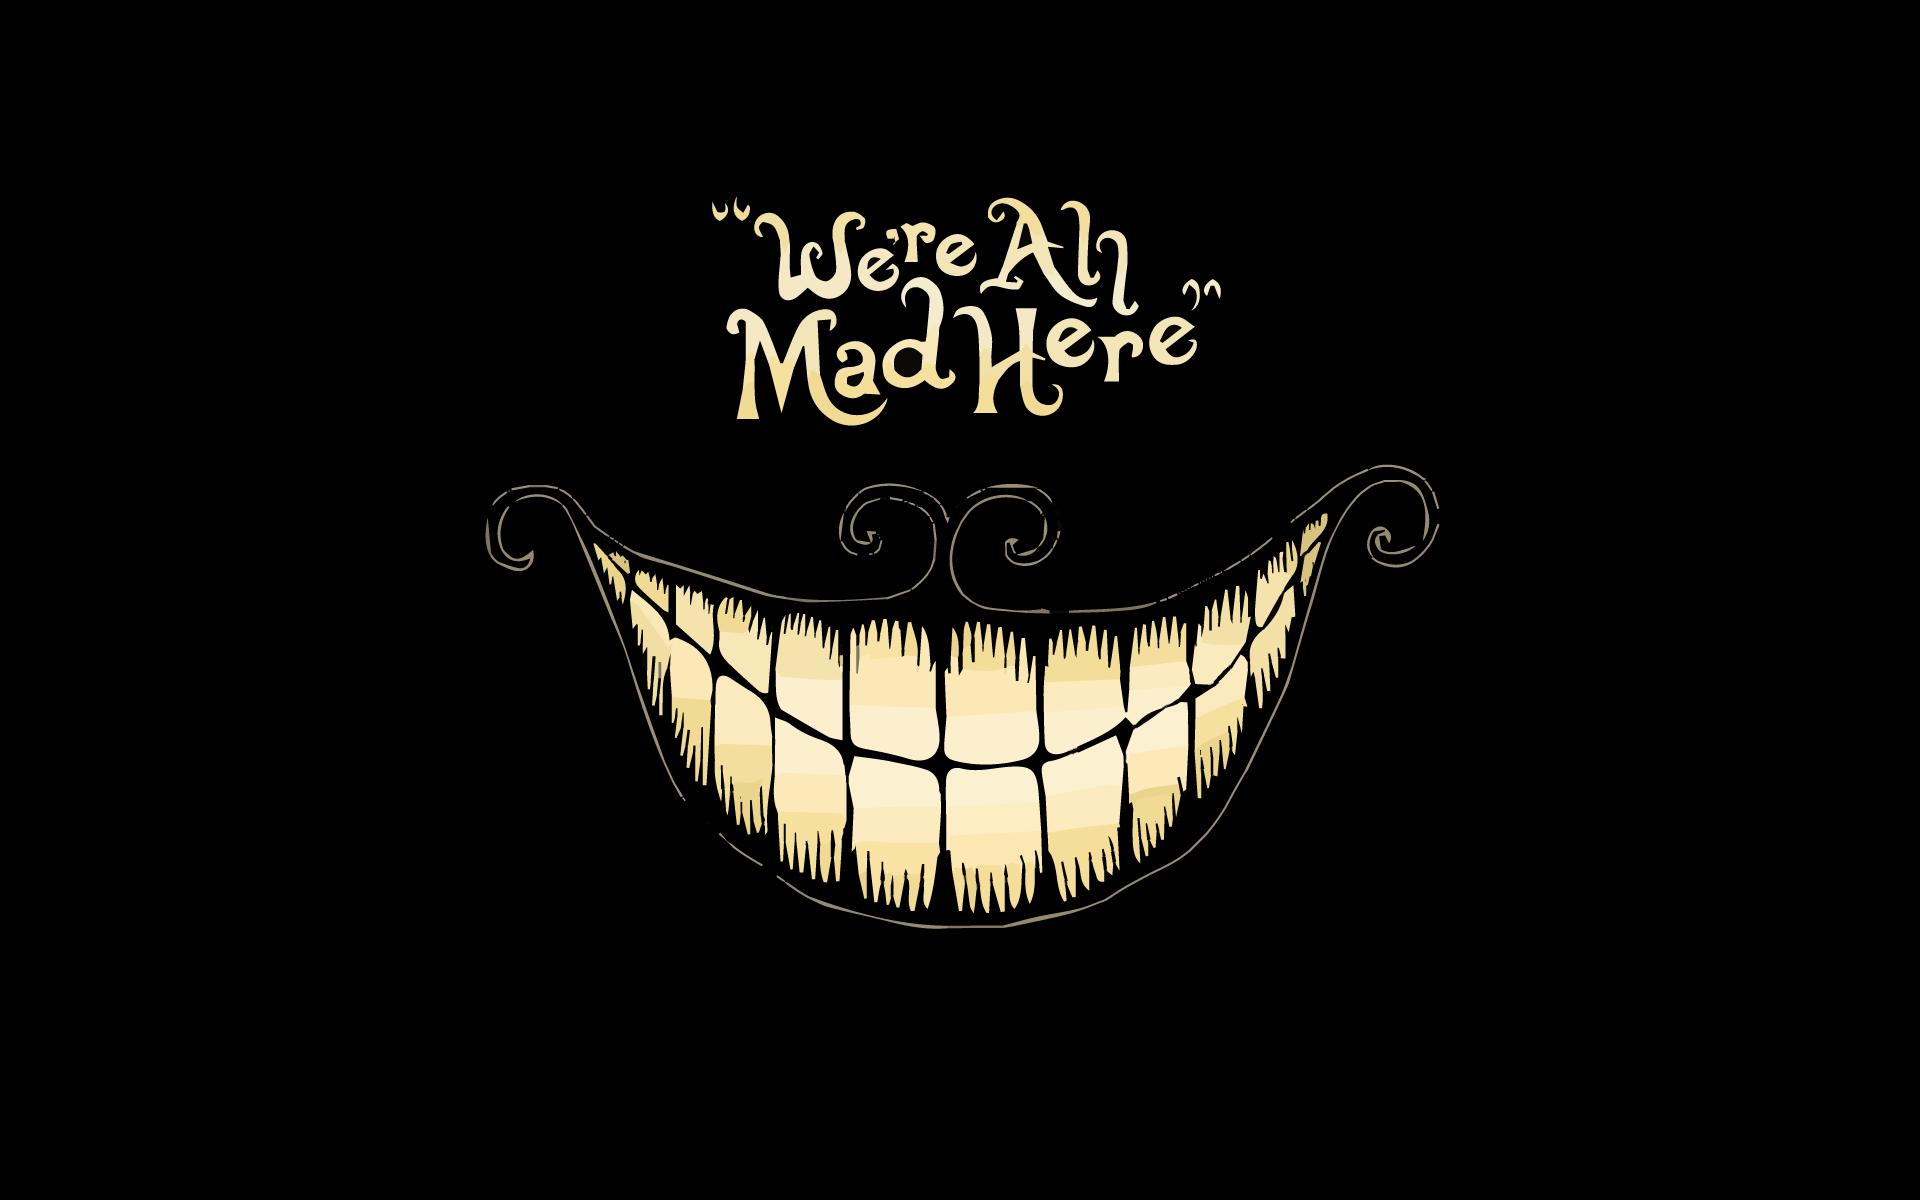 Free Download Alice In Wonderland Wallpaper Tim Lelek February 14